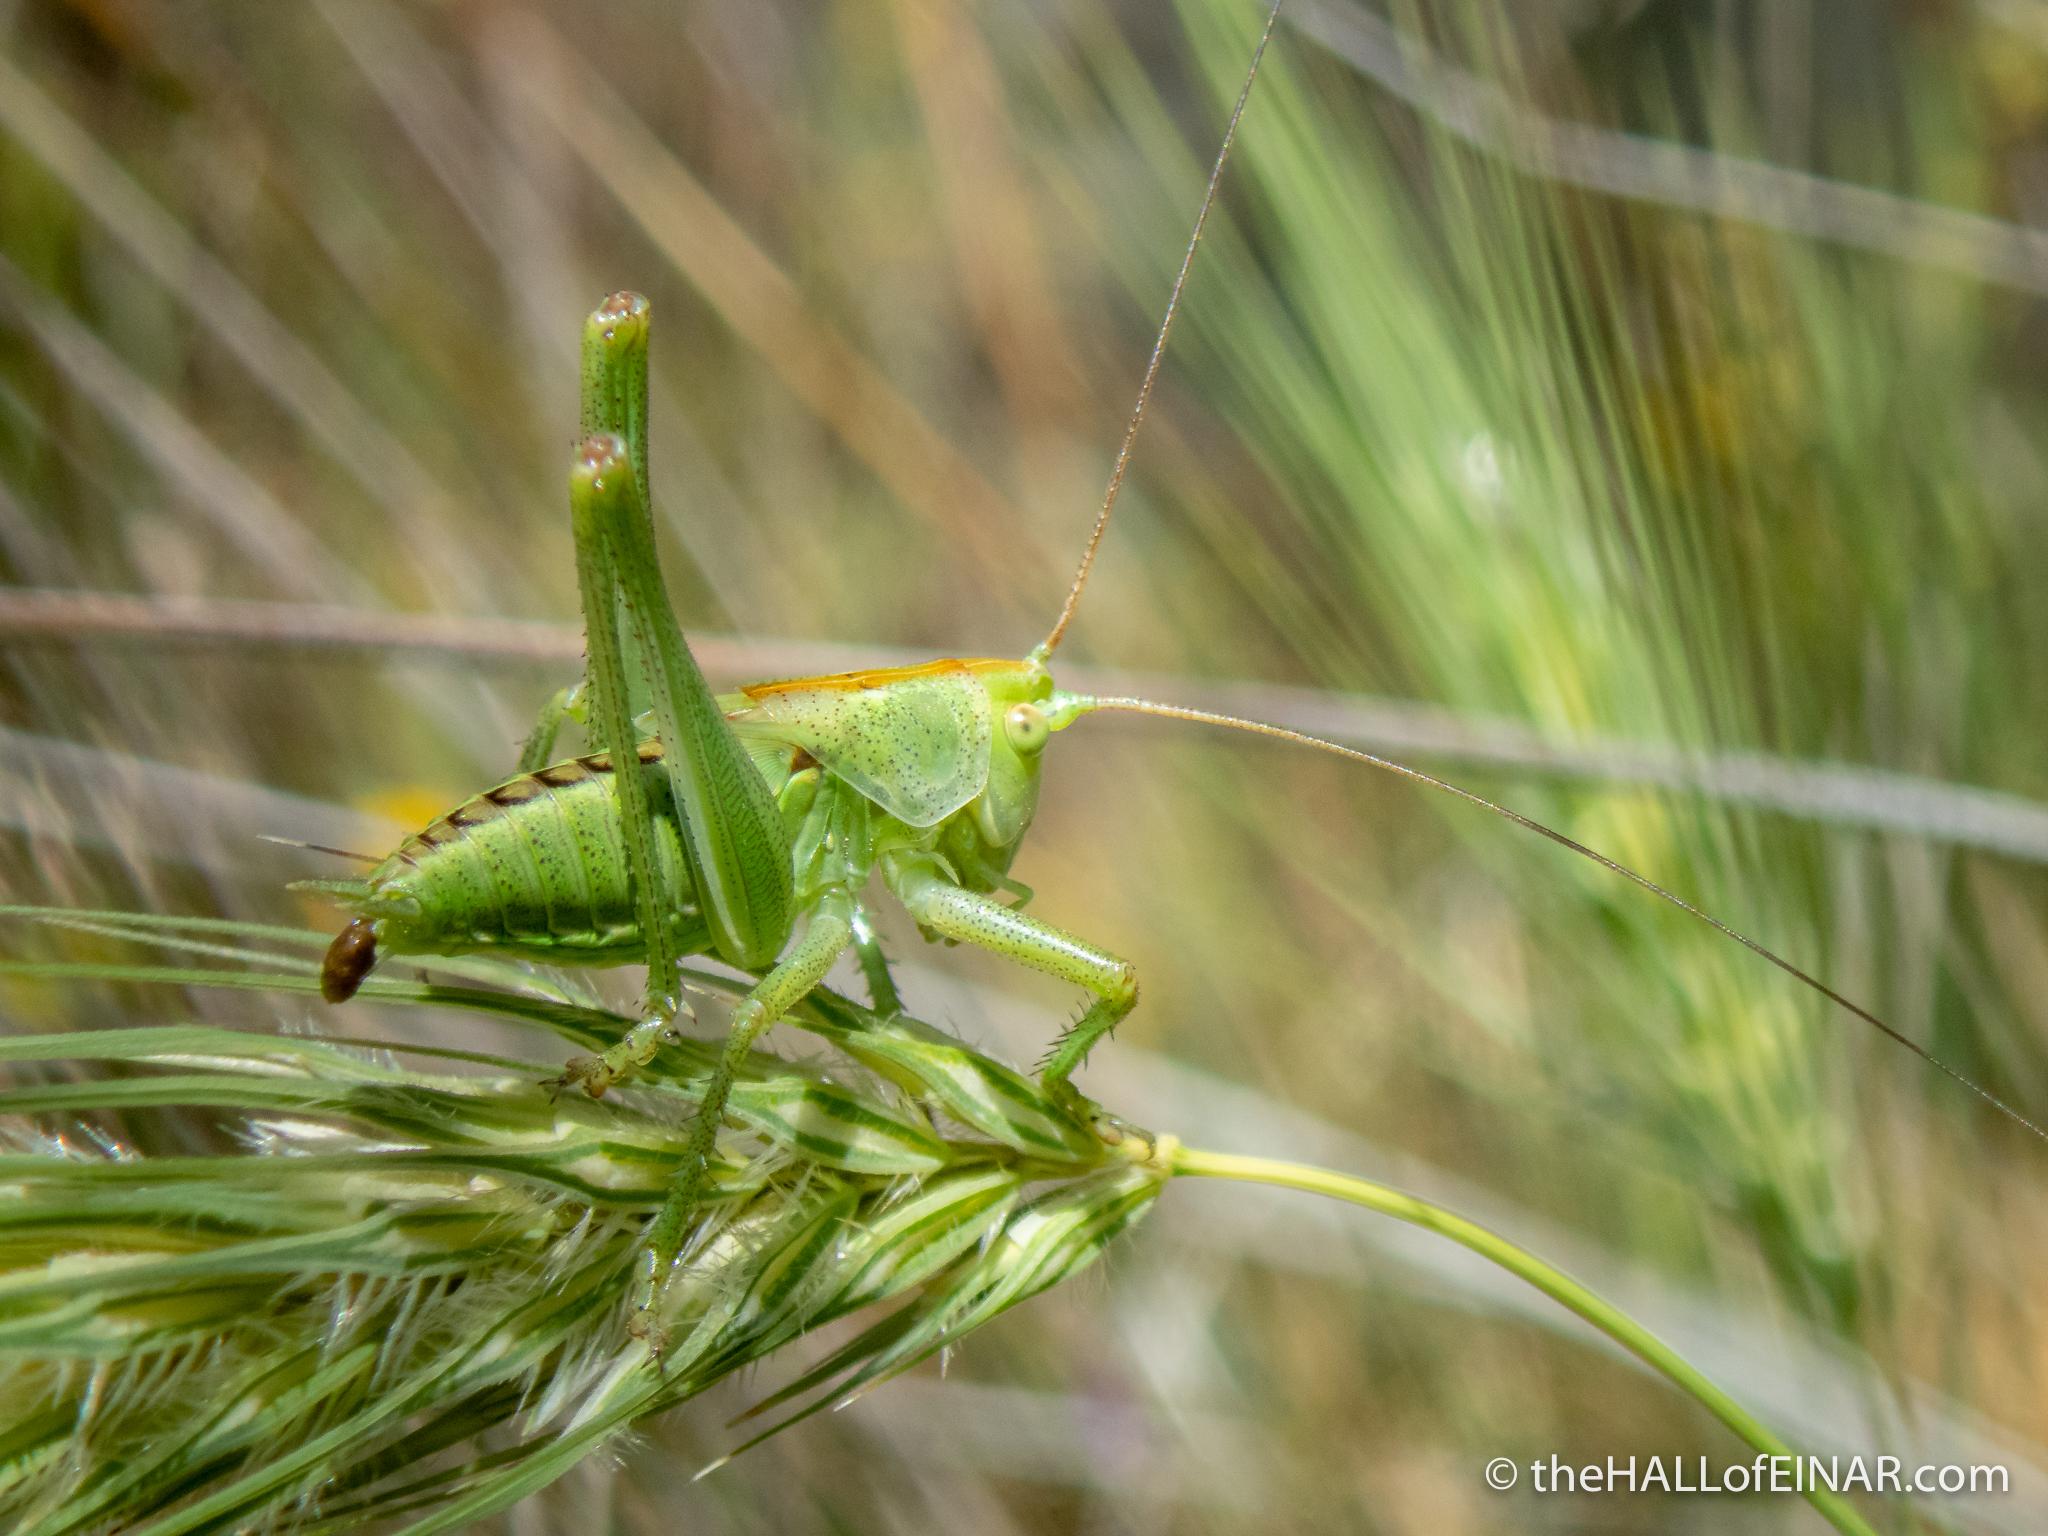 Green Cricket - Matera - The Hall of Einar - photograph (c) David Bailey (not the)